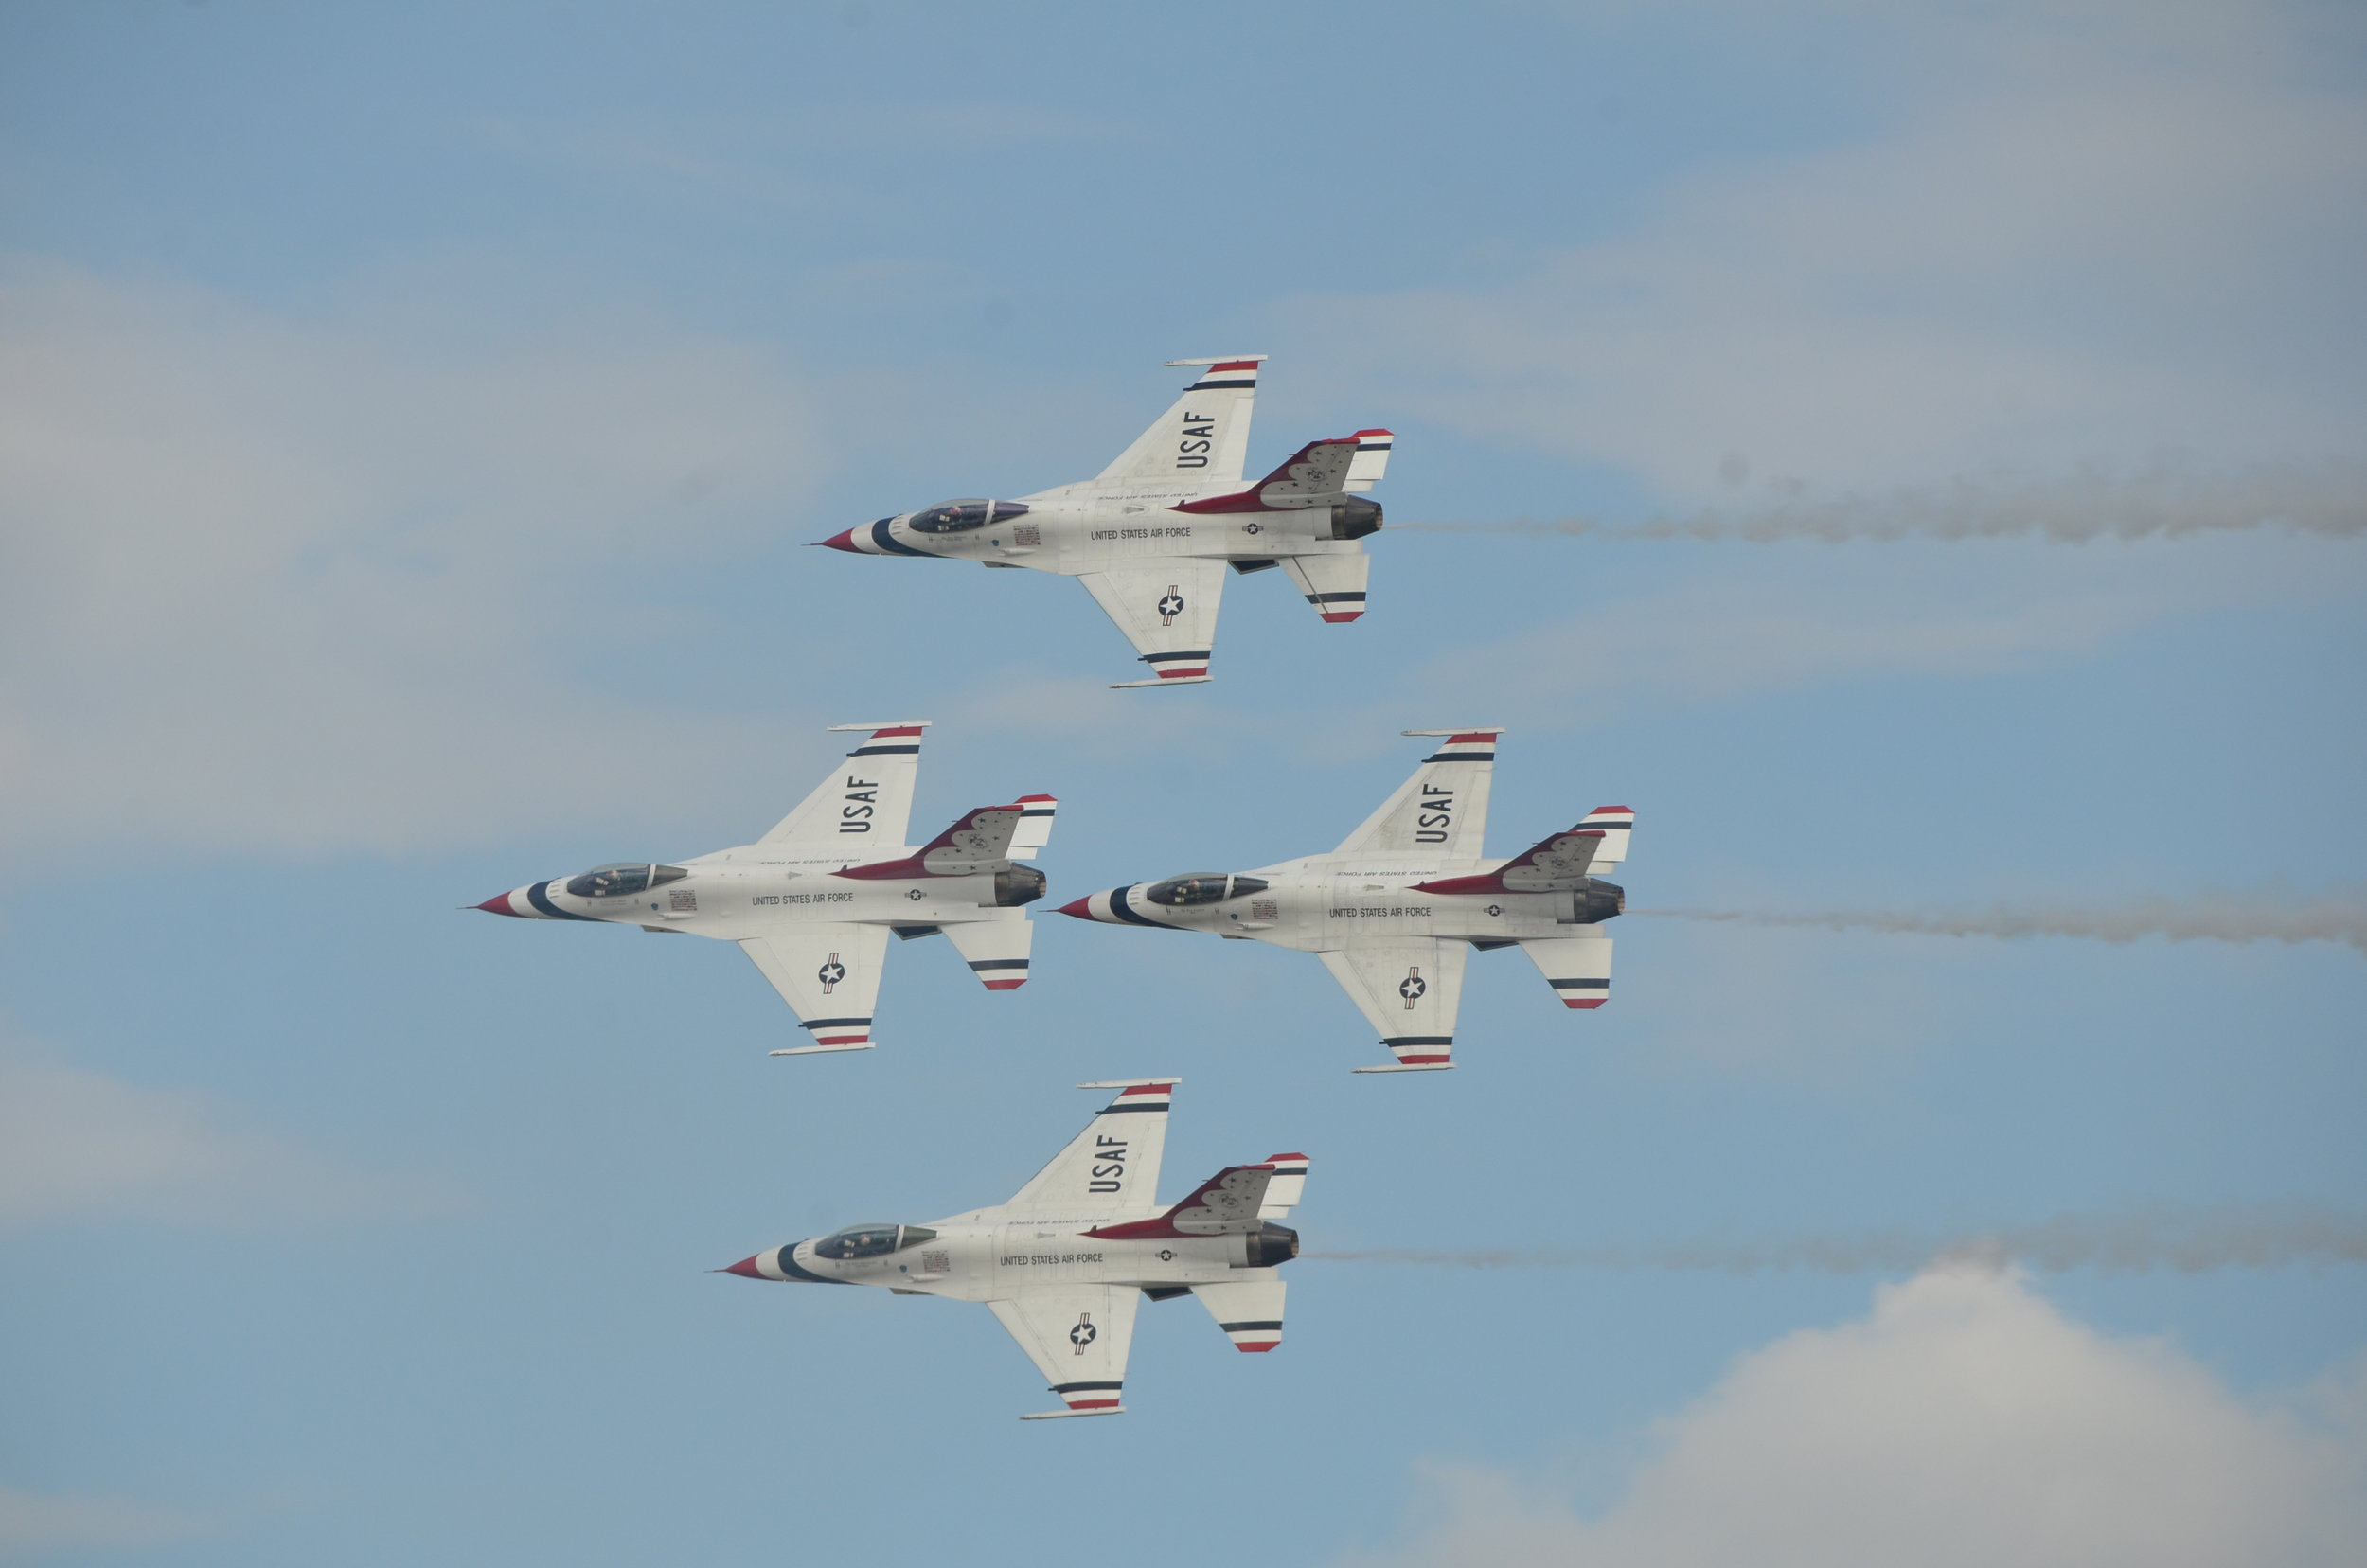 USAF Thunderbirds at Andrews AFB Sep 16 2017